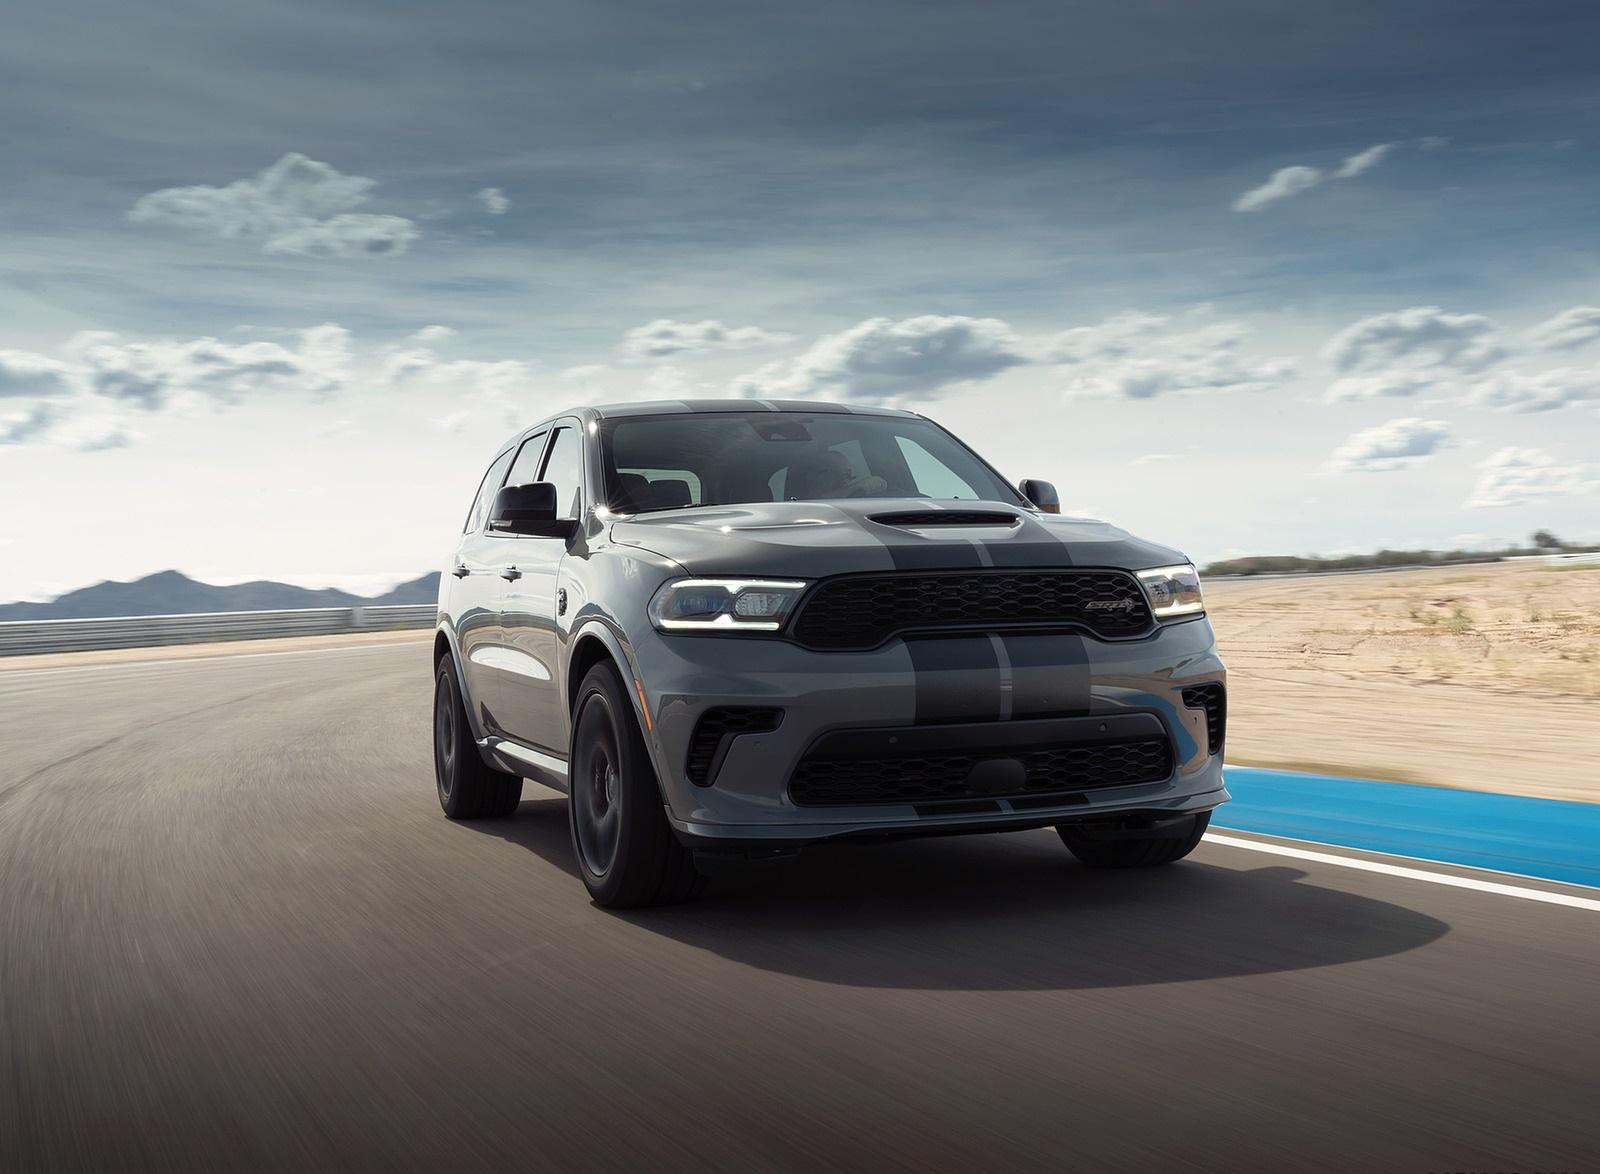 2021 Dodge Durango Srt Hellcat Front Wallpapers 9 Newcarcars